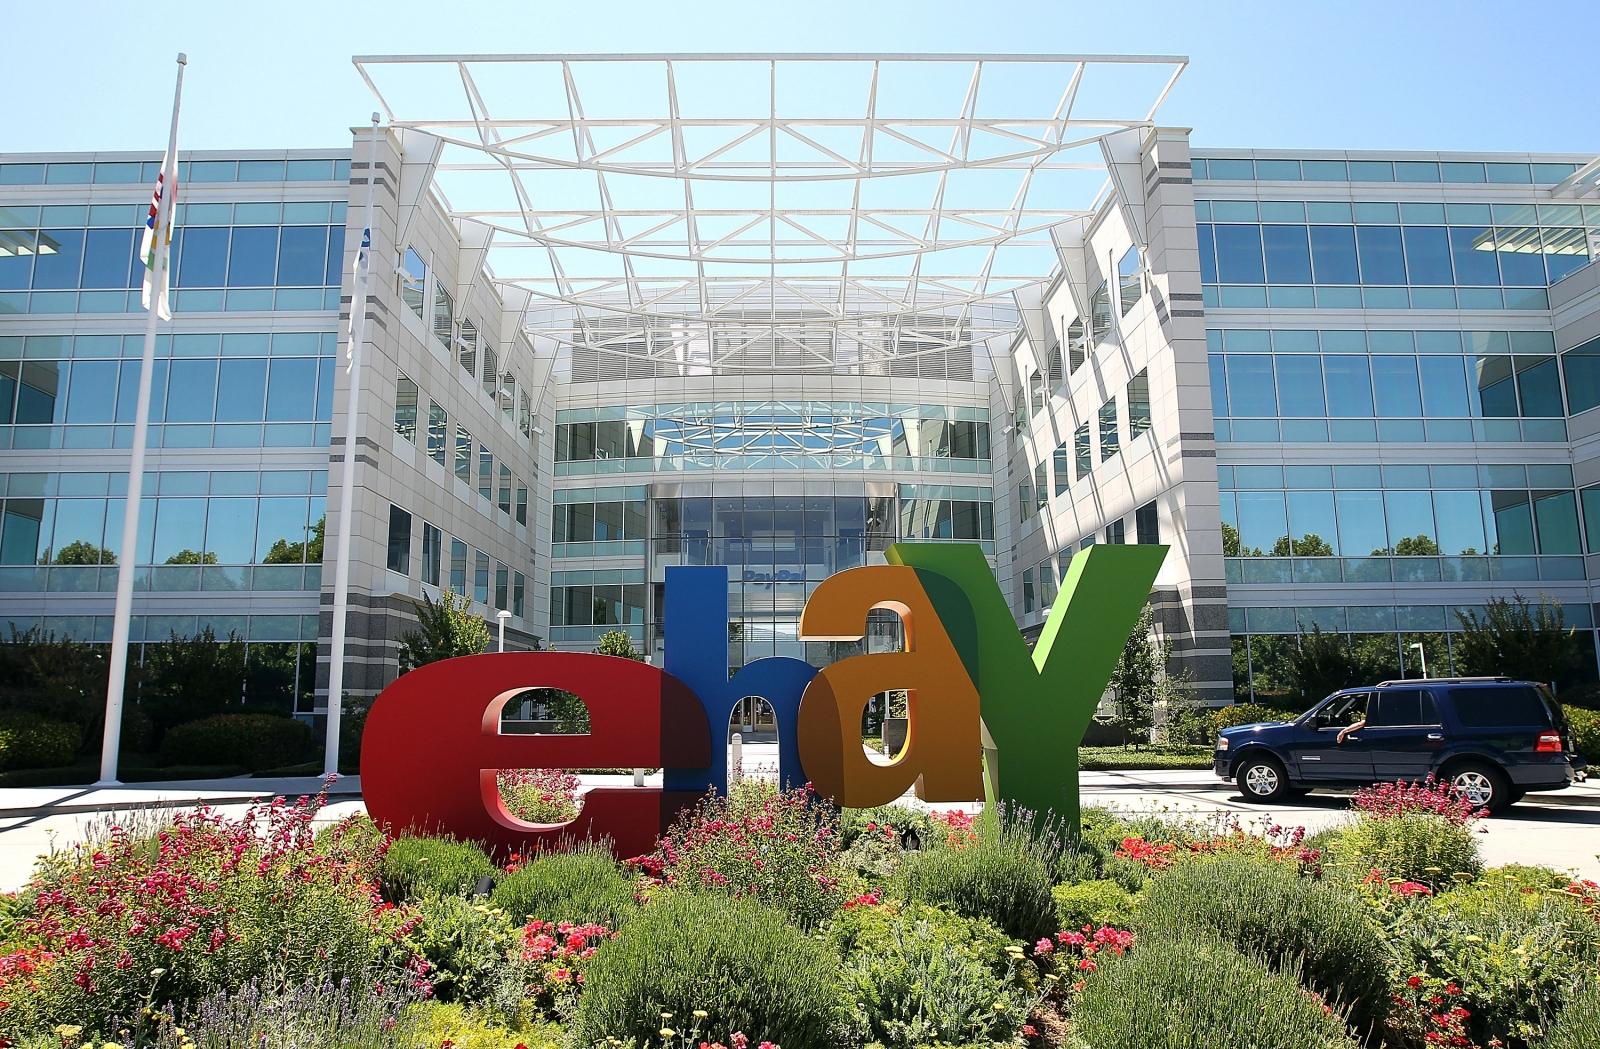 ebay sotheby's online auction